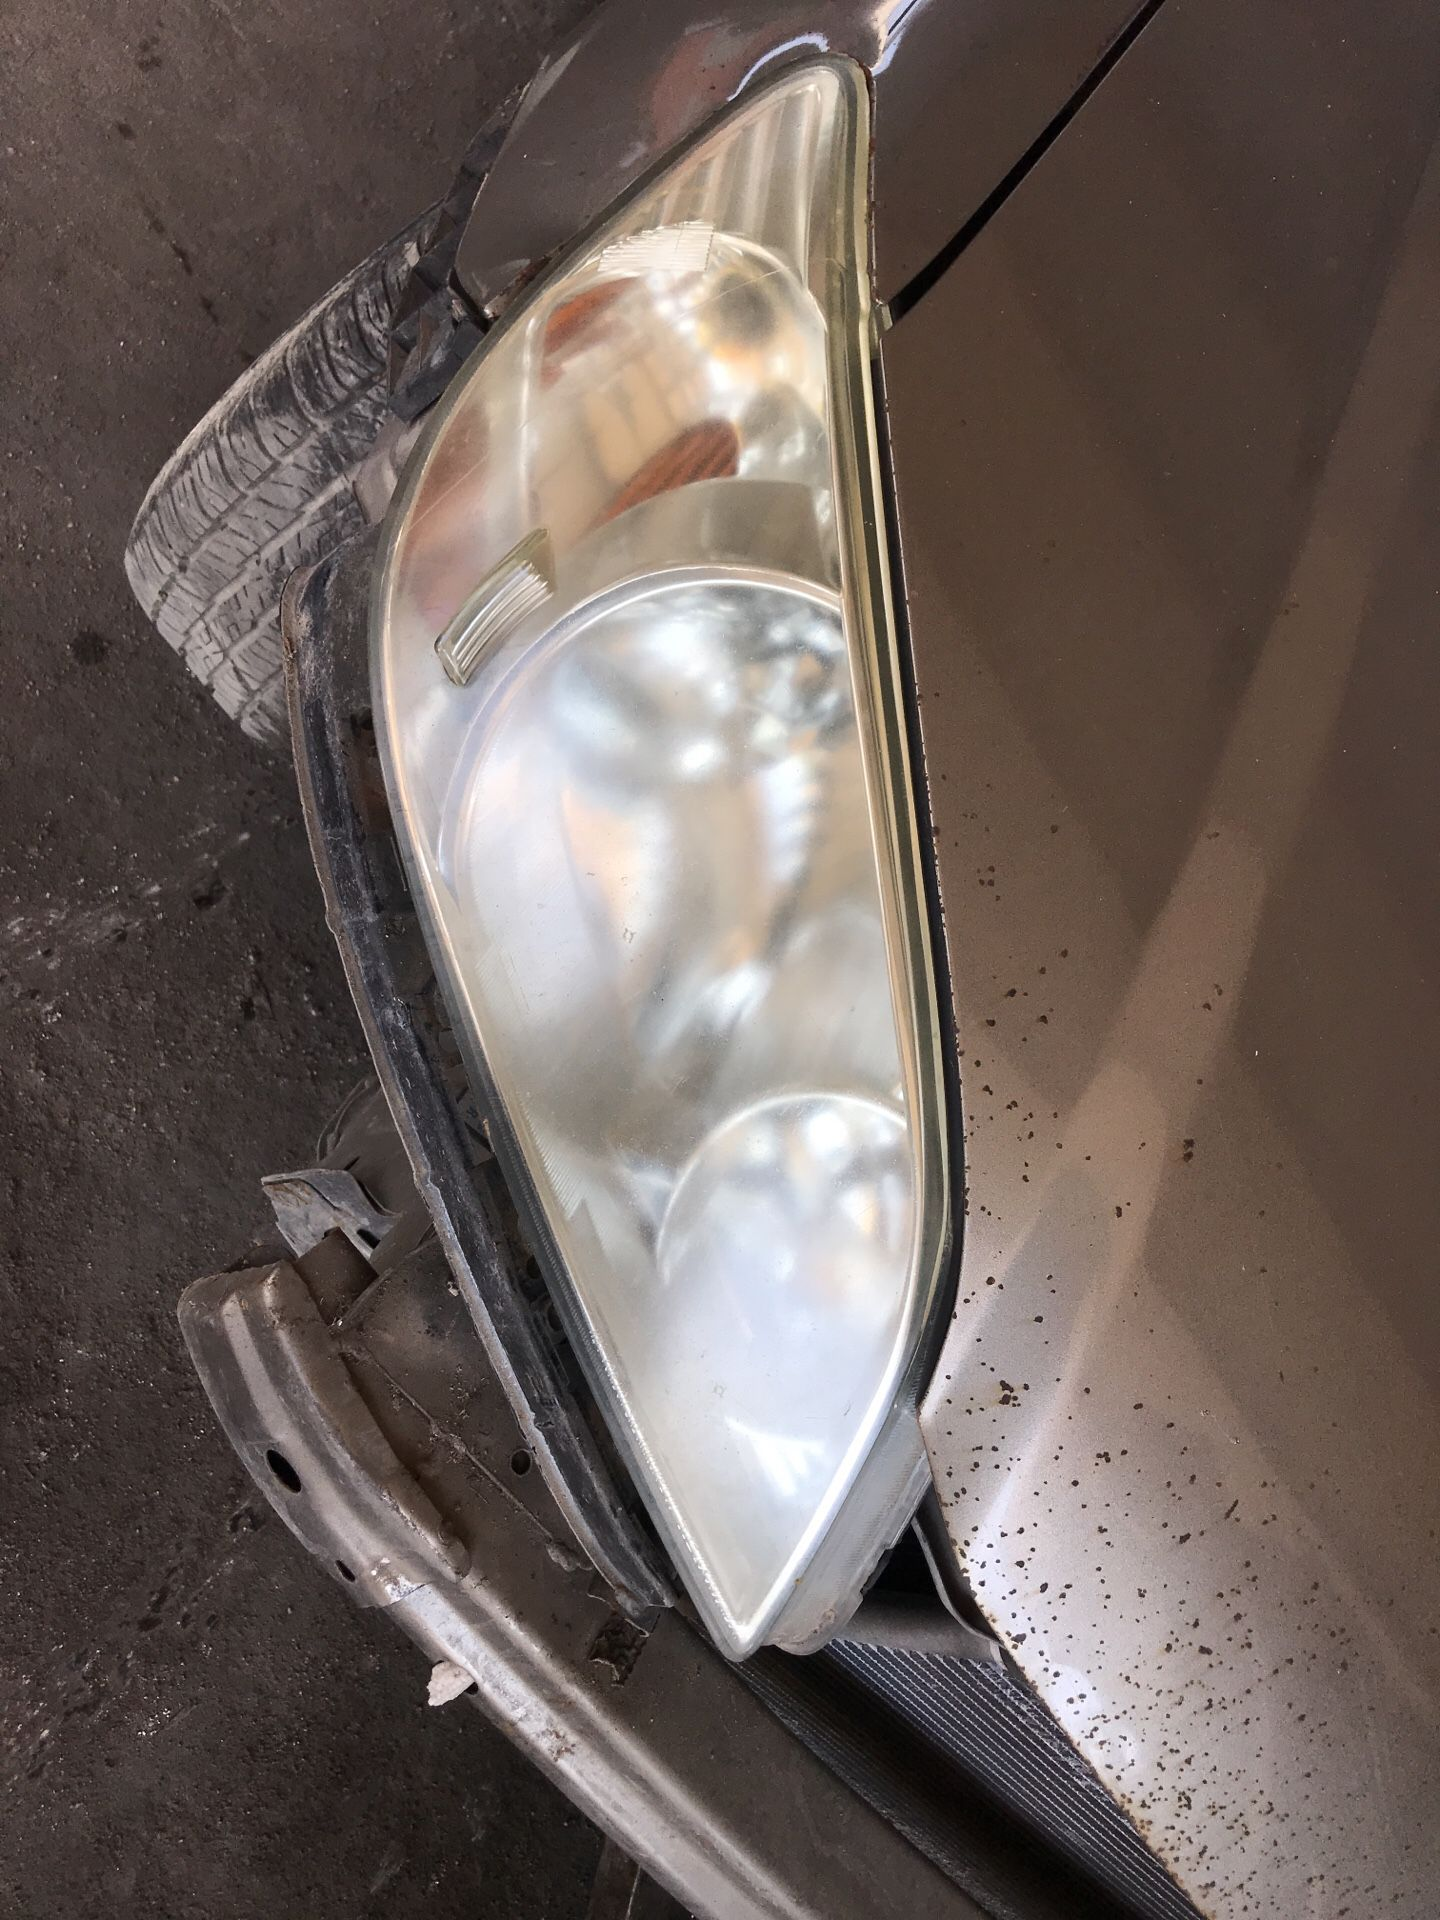 Left and right 04 Honda Civic headlights